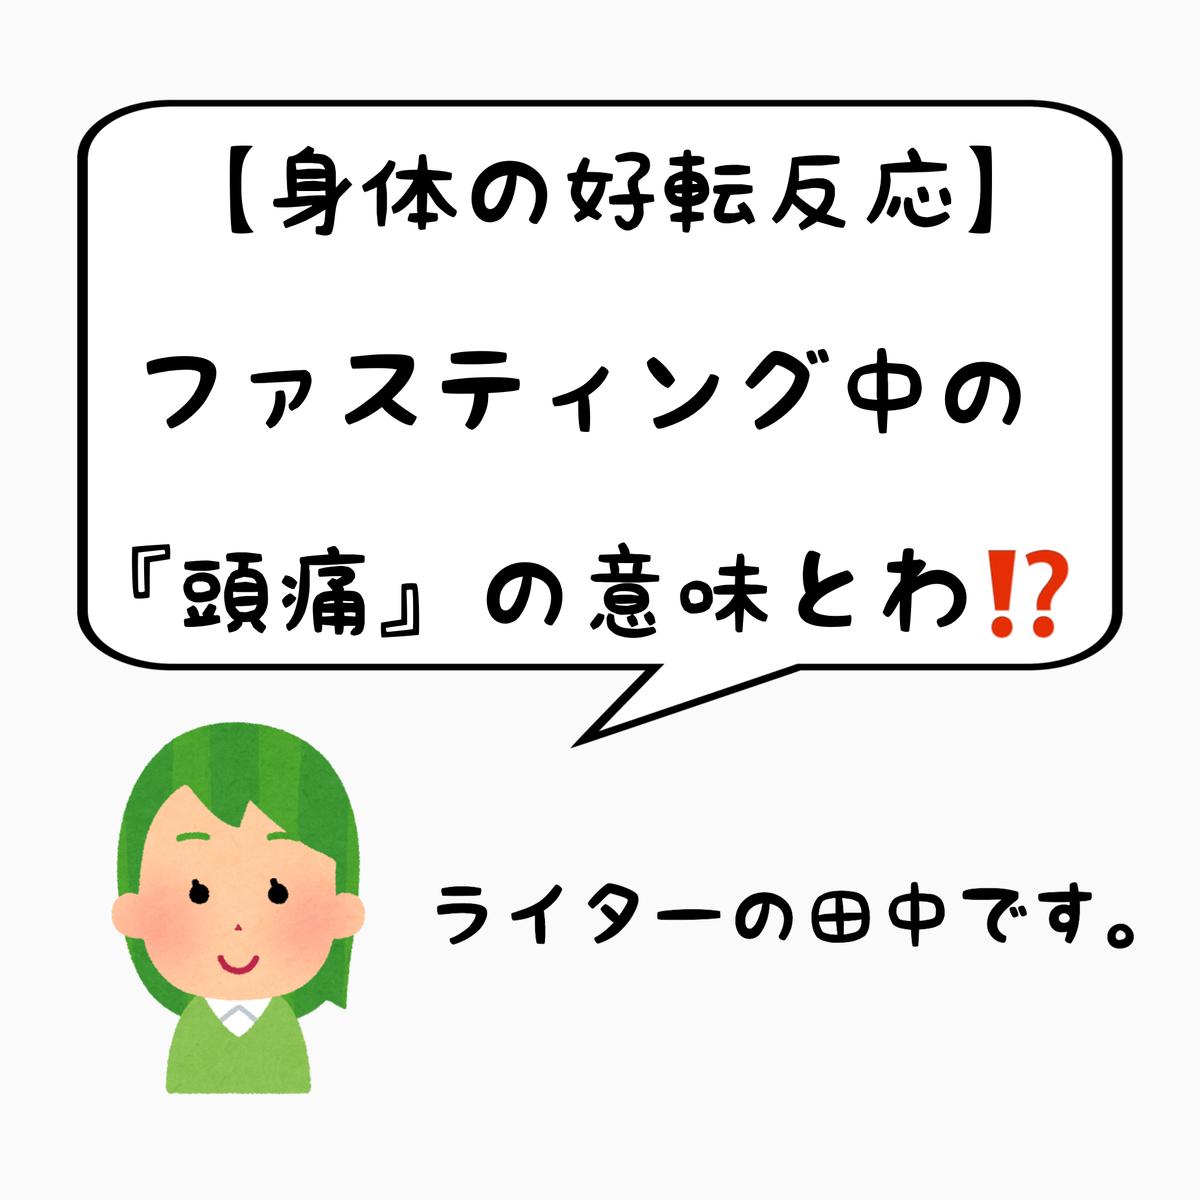 f:id:nokonoko_o:20201103173211j:plain